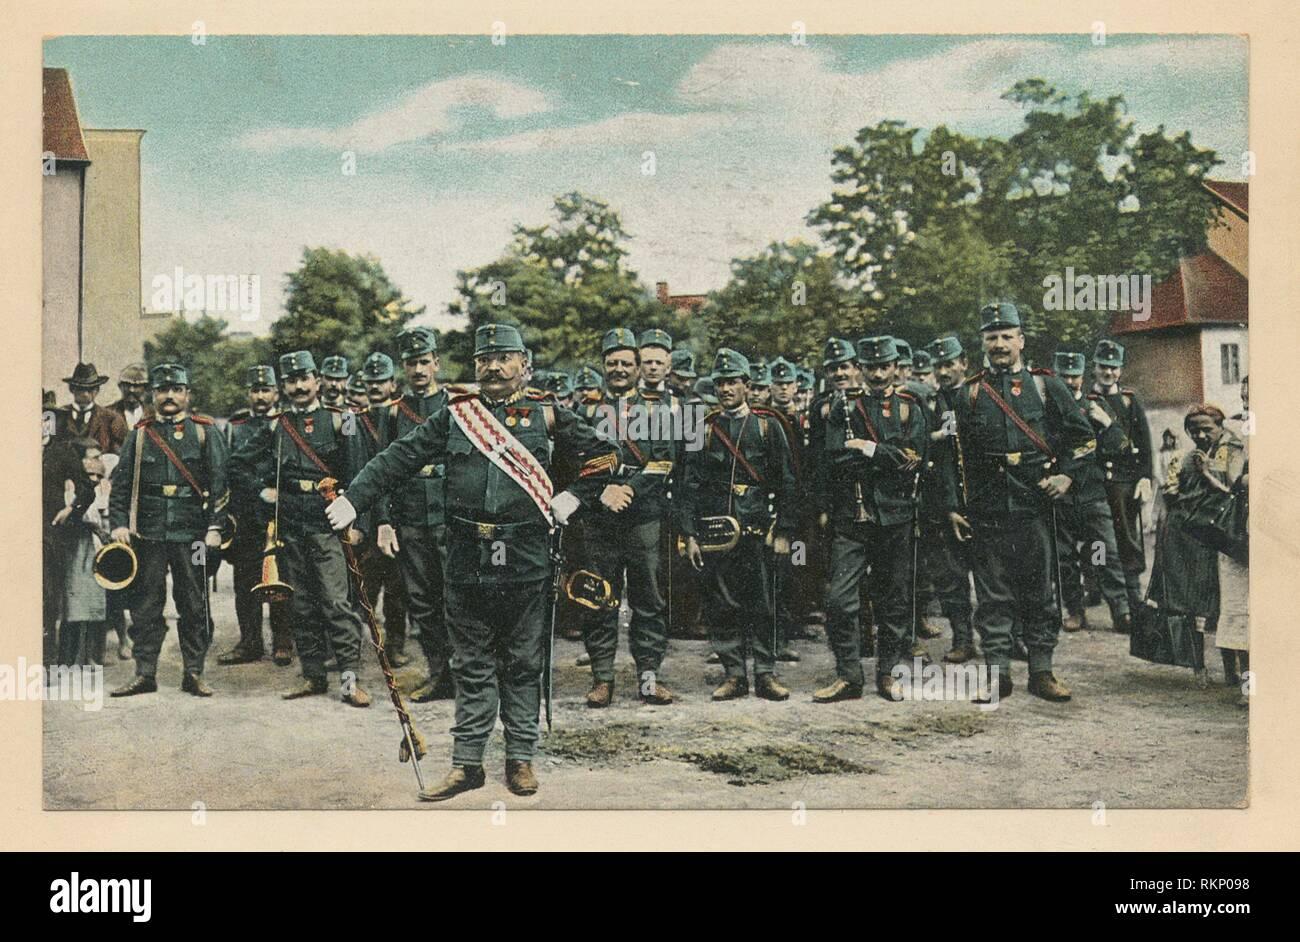 Band of an Austrian infantry regiment. Vinkhuijzen, Hendrik Jacobus (Collector). The Vinkhuijzen collection of military uniforms Austria Austria, - Stock Image